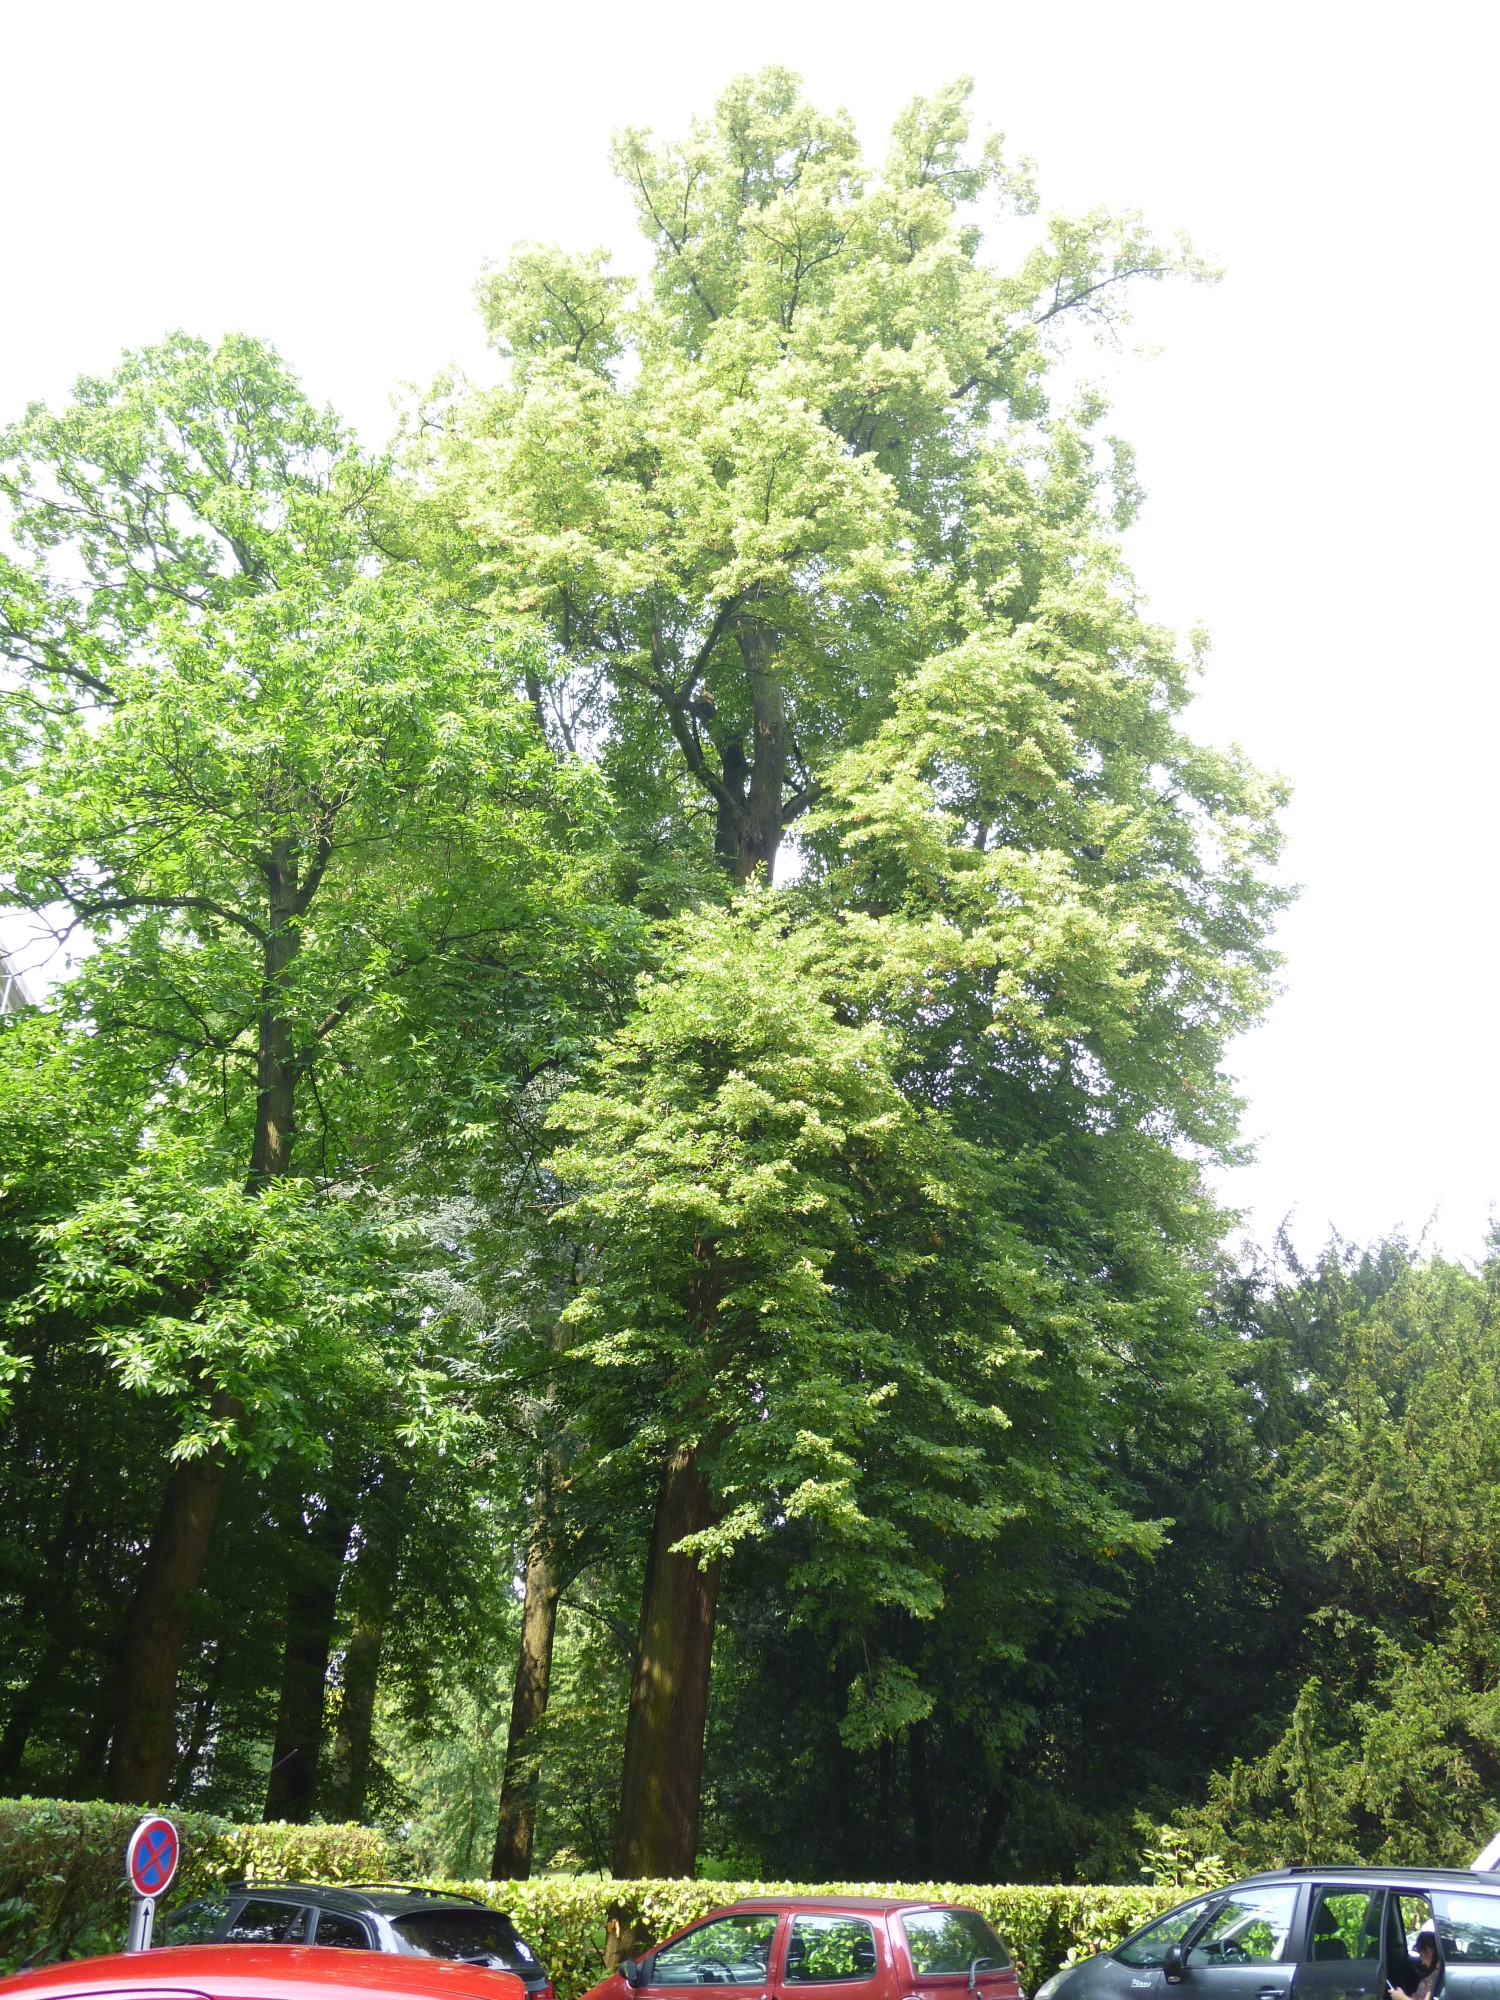 Tilia sp – Watermael-Boitsfort, Avenue Emile Van Becelaere, 24-26 –  29 Juillet 2014